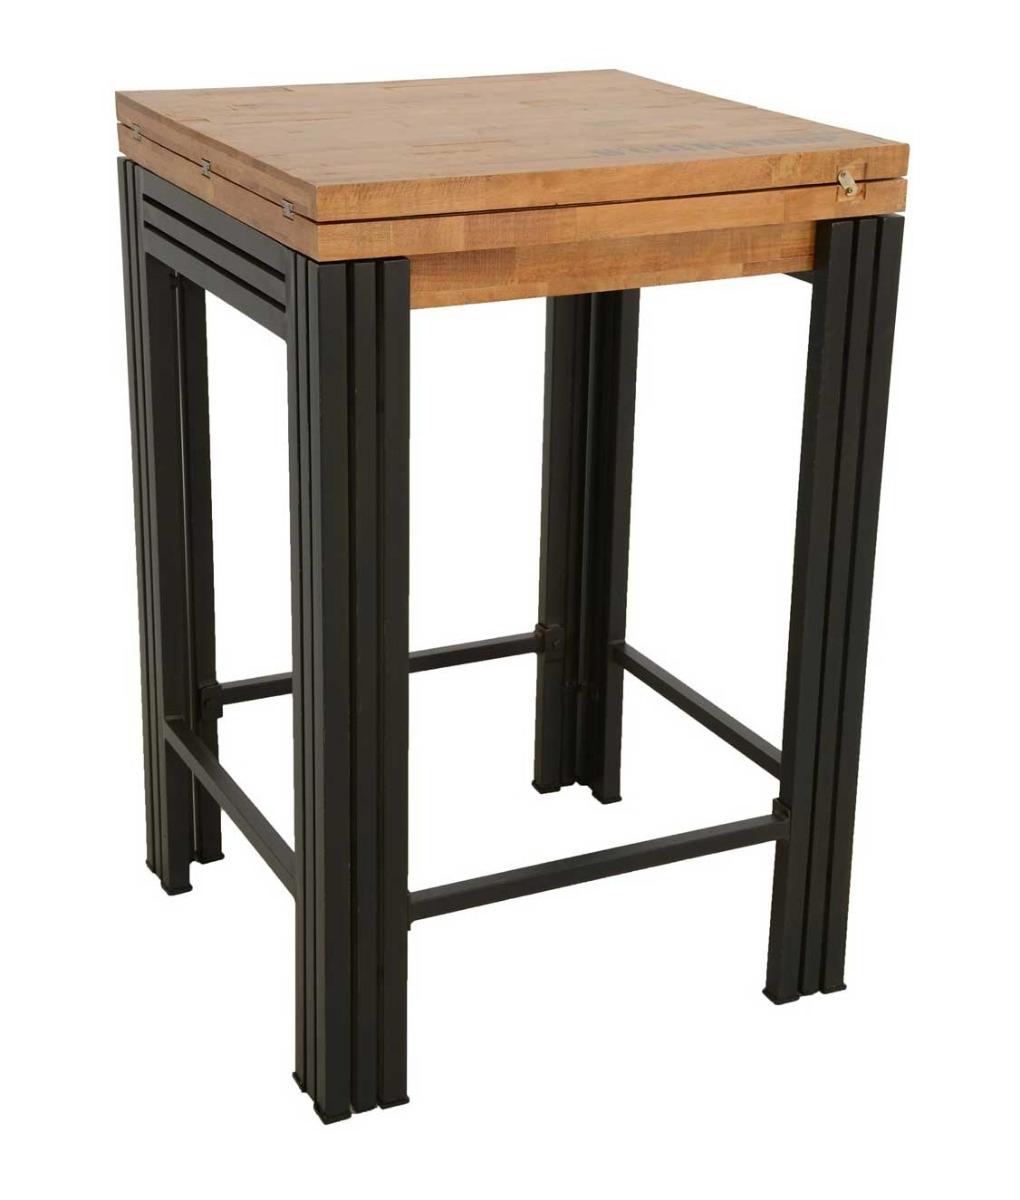 indus table de bar industrielle rallonge int gr e. Black Bedroom Furniture Sets. Home Design Ideas